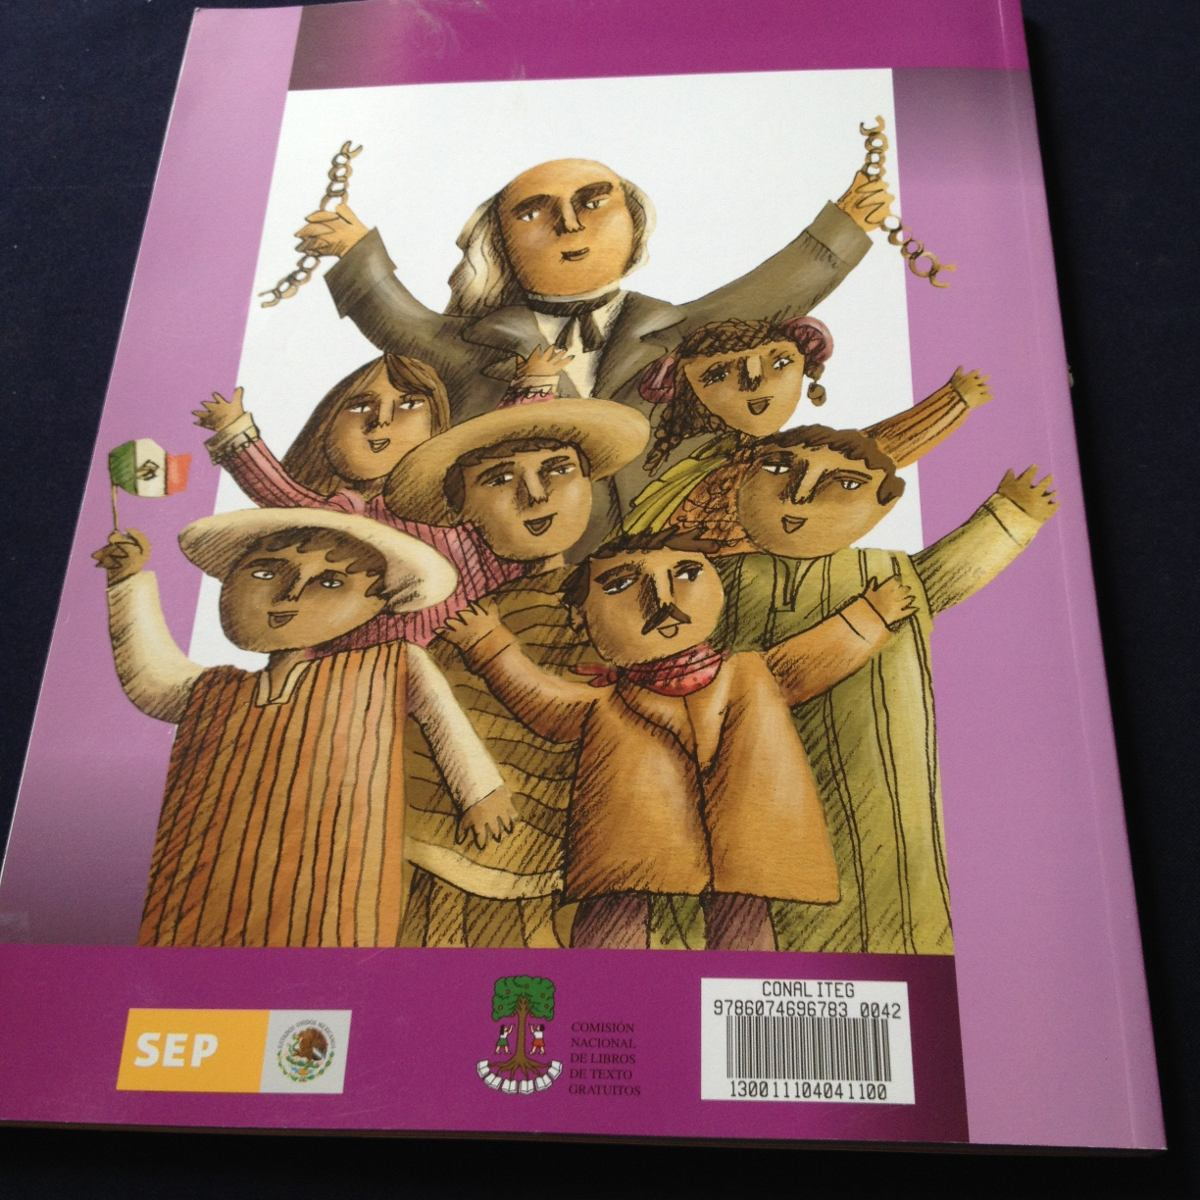 Historia Cuarto Grado Sep - $ 38.00 en Mercado Libre